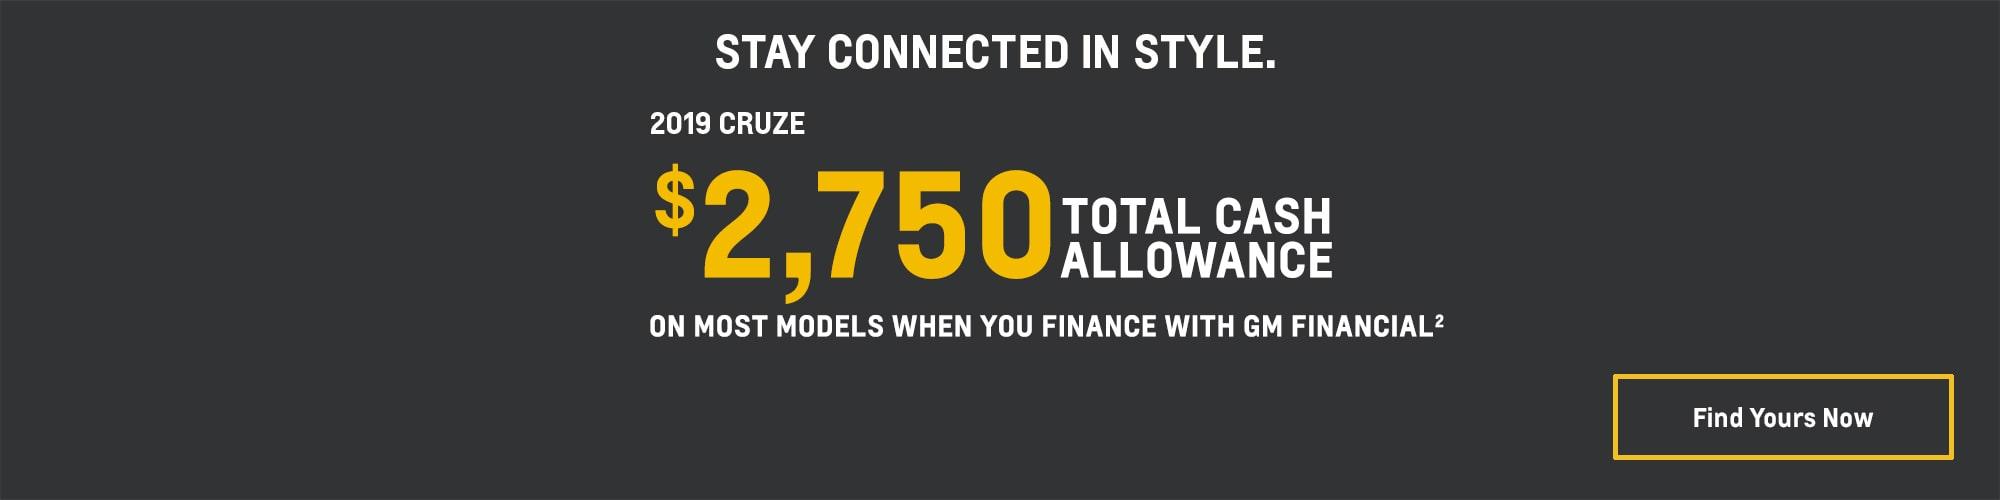 2019 Cruze: $2,750 Total Cash Allowance